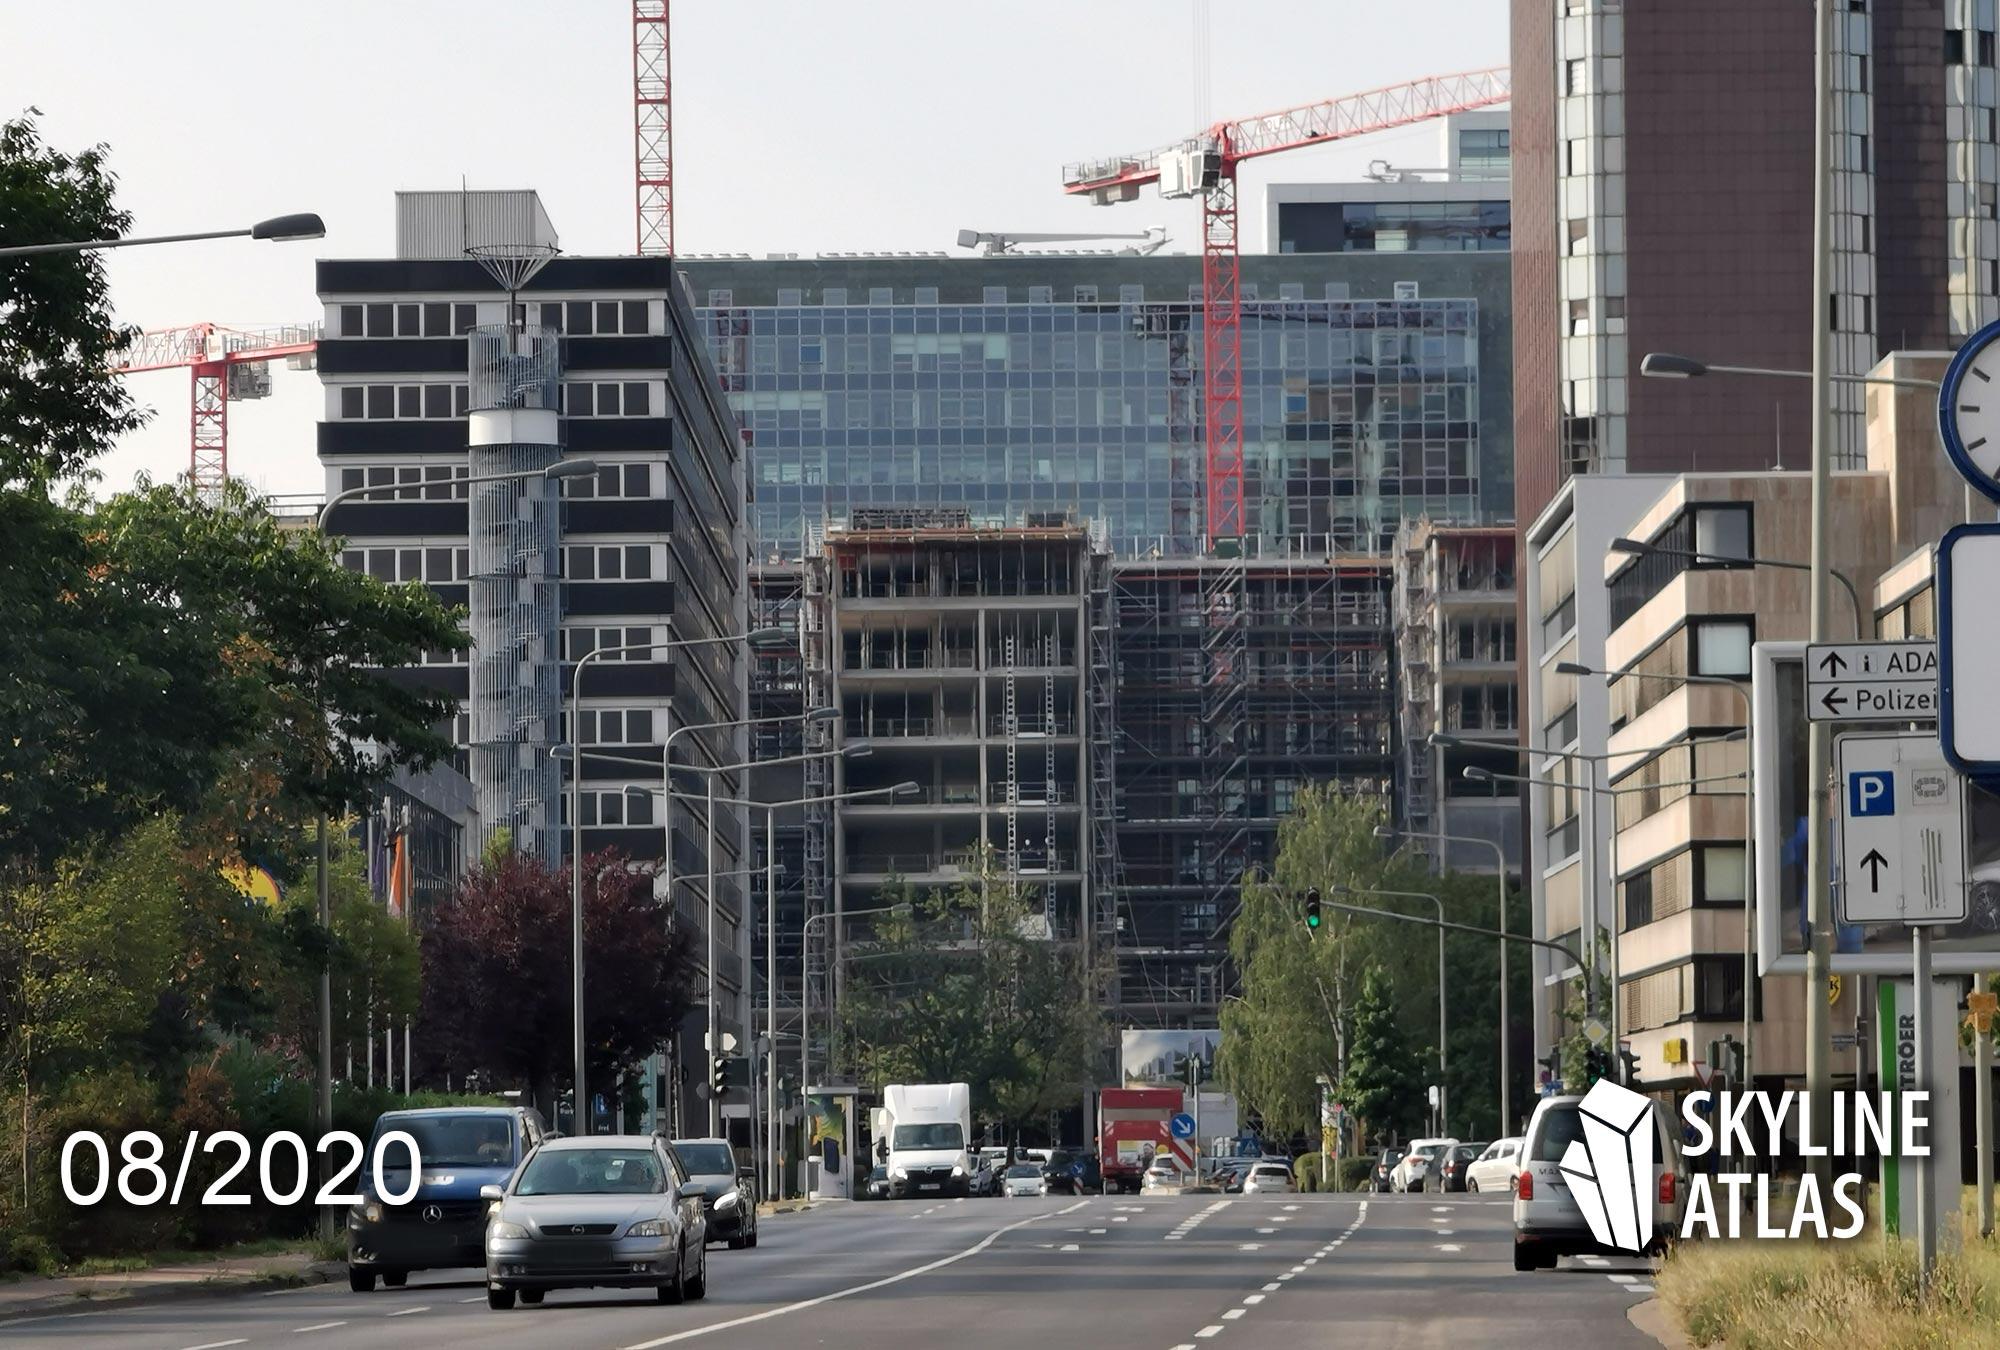 Deka Niederrad - Neubau Deka Fonds im Lyoner Viertel - Bürohaus Frankfurt - Baustelle August 2020